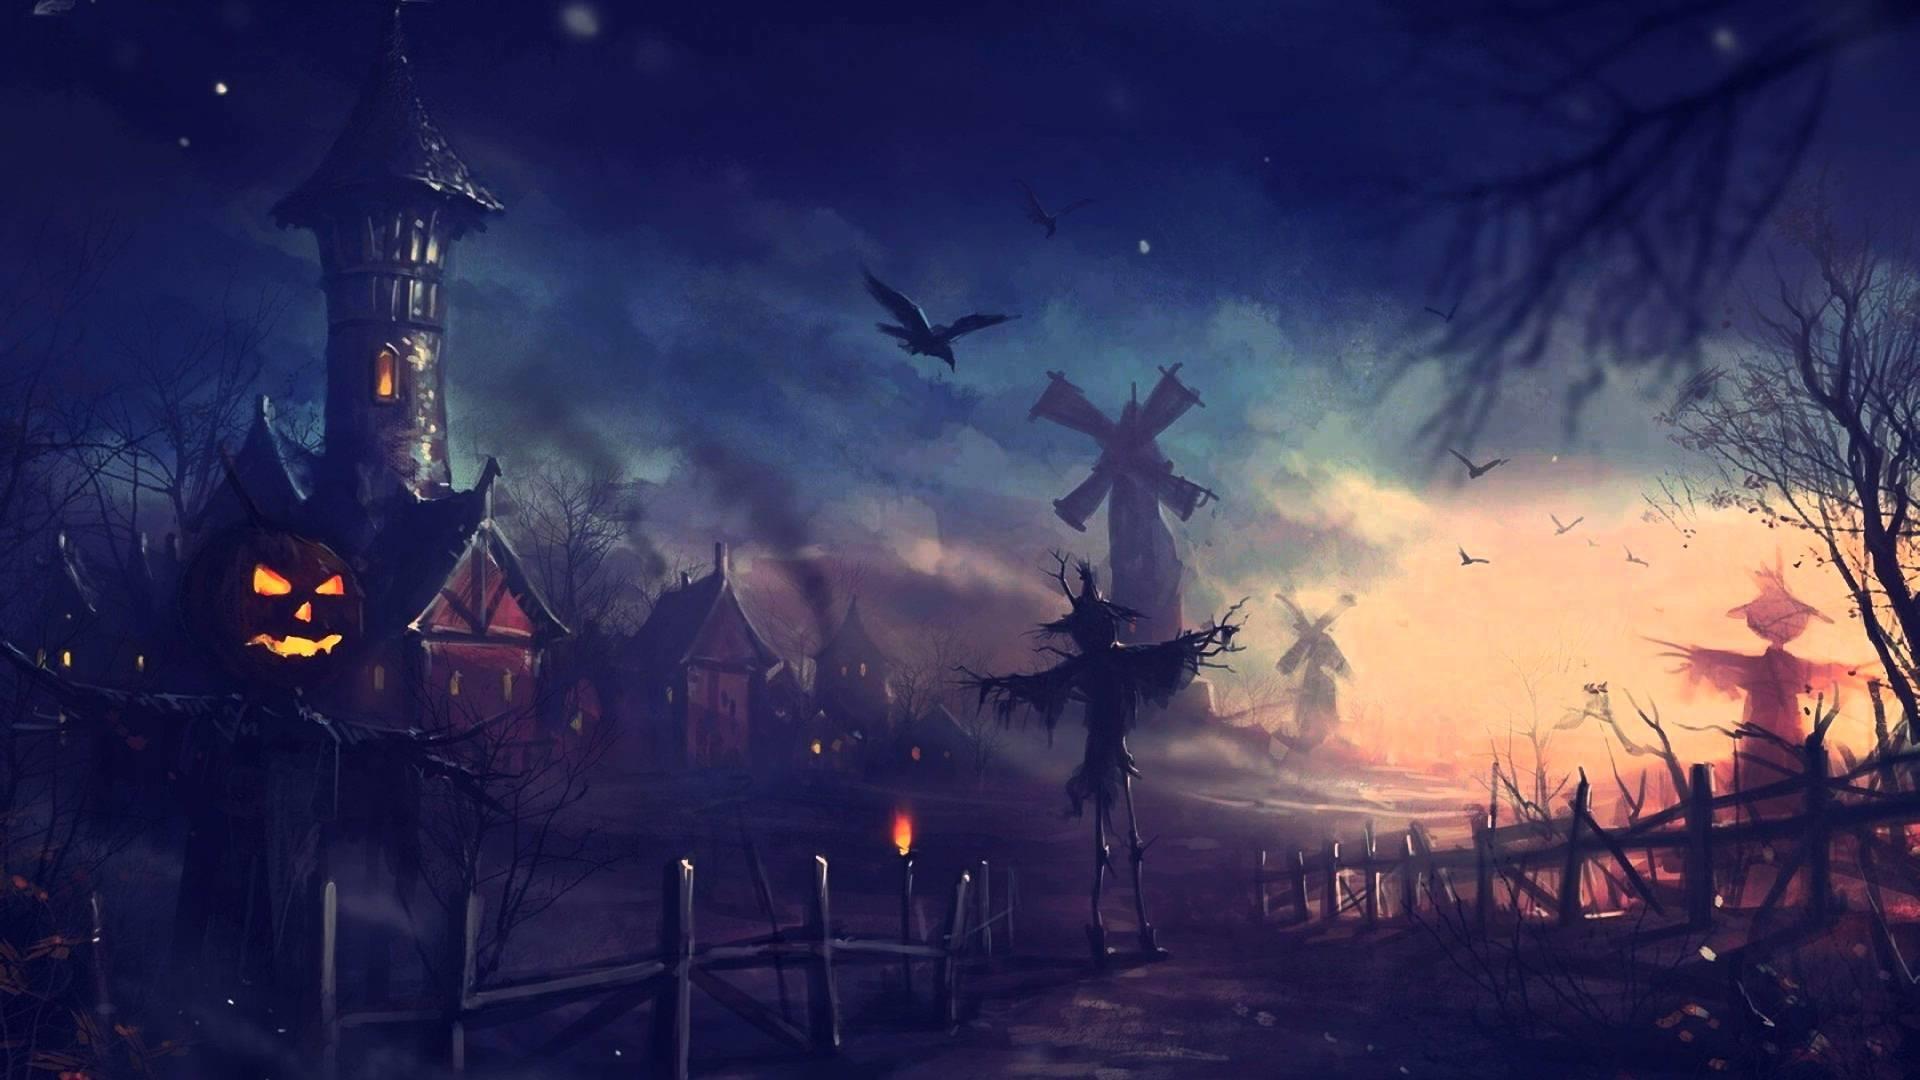 Spooky Halloween Night 1920x1080 wallpaper 1920x1080